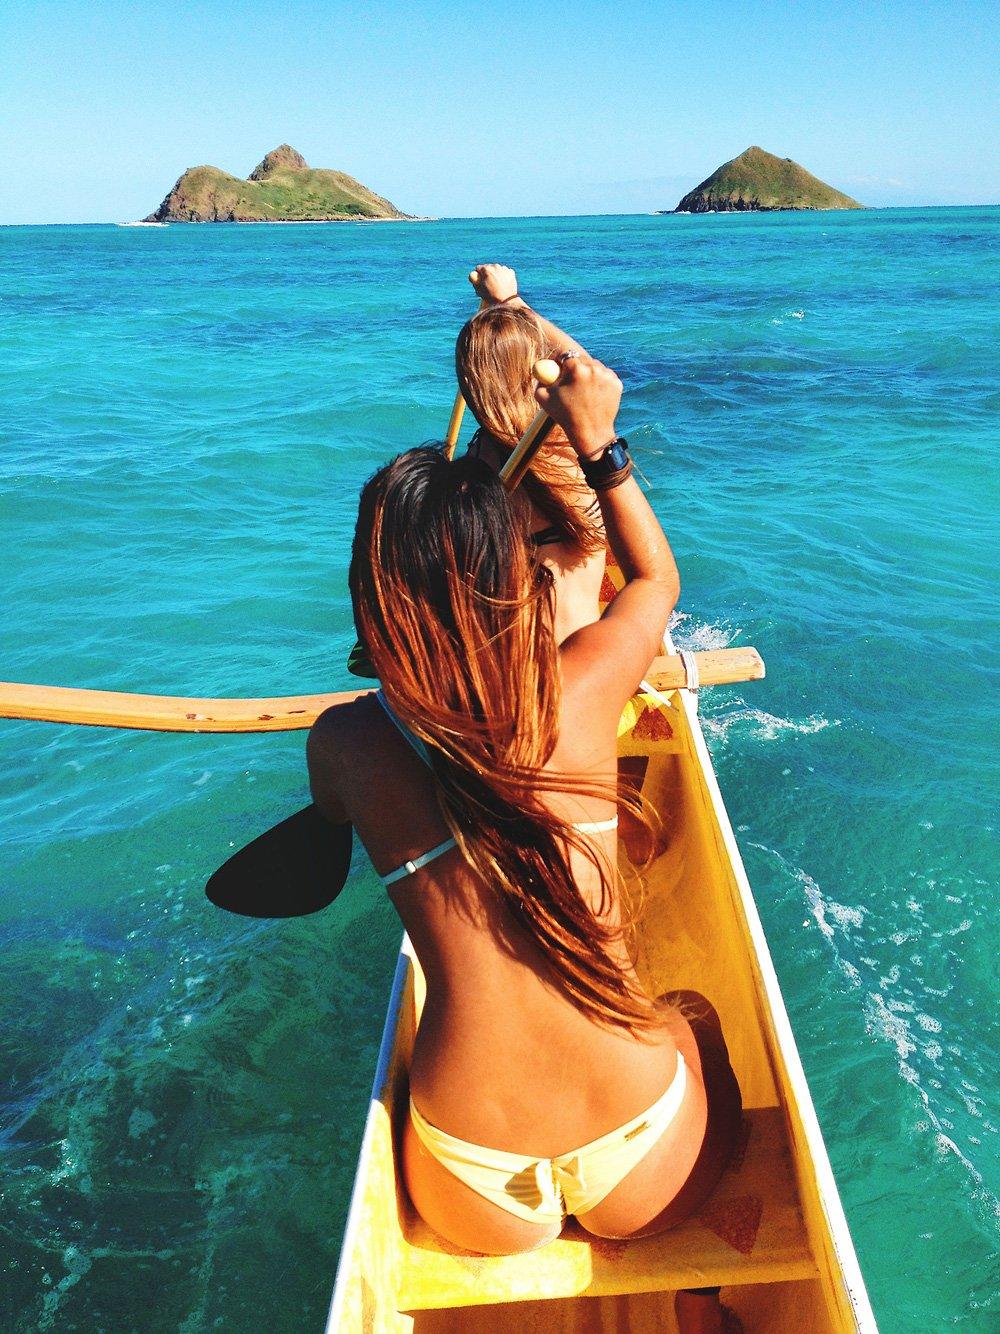 Прикольное фото девушек на море